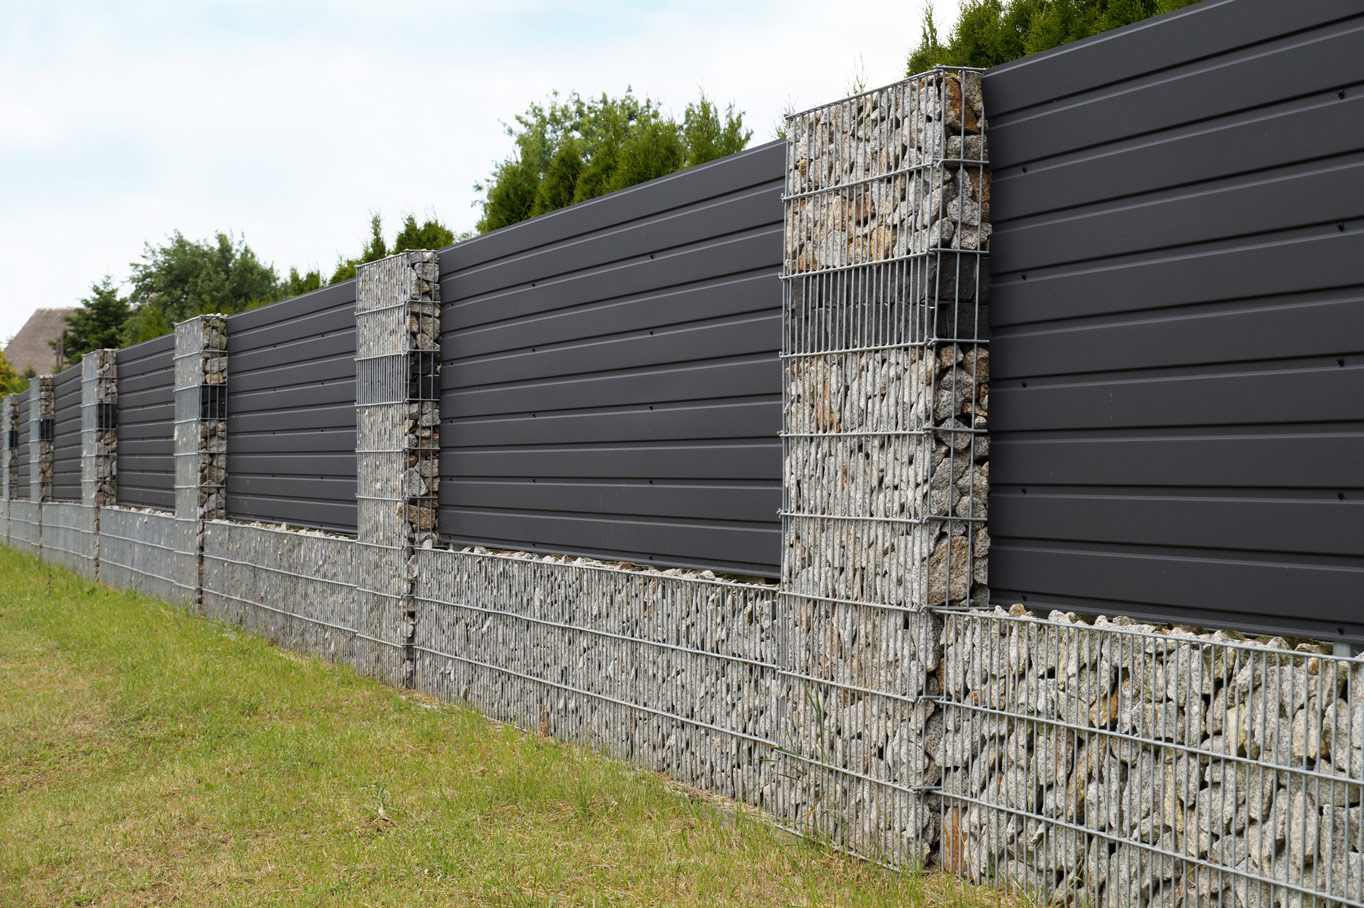 garden-fence-metal-panel-stone-wall